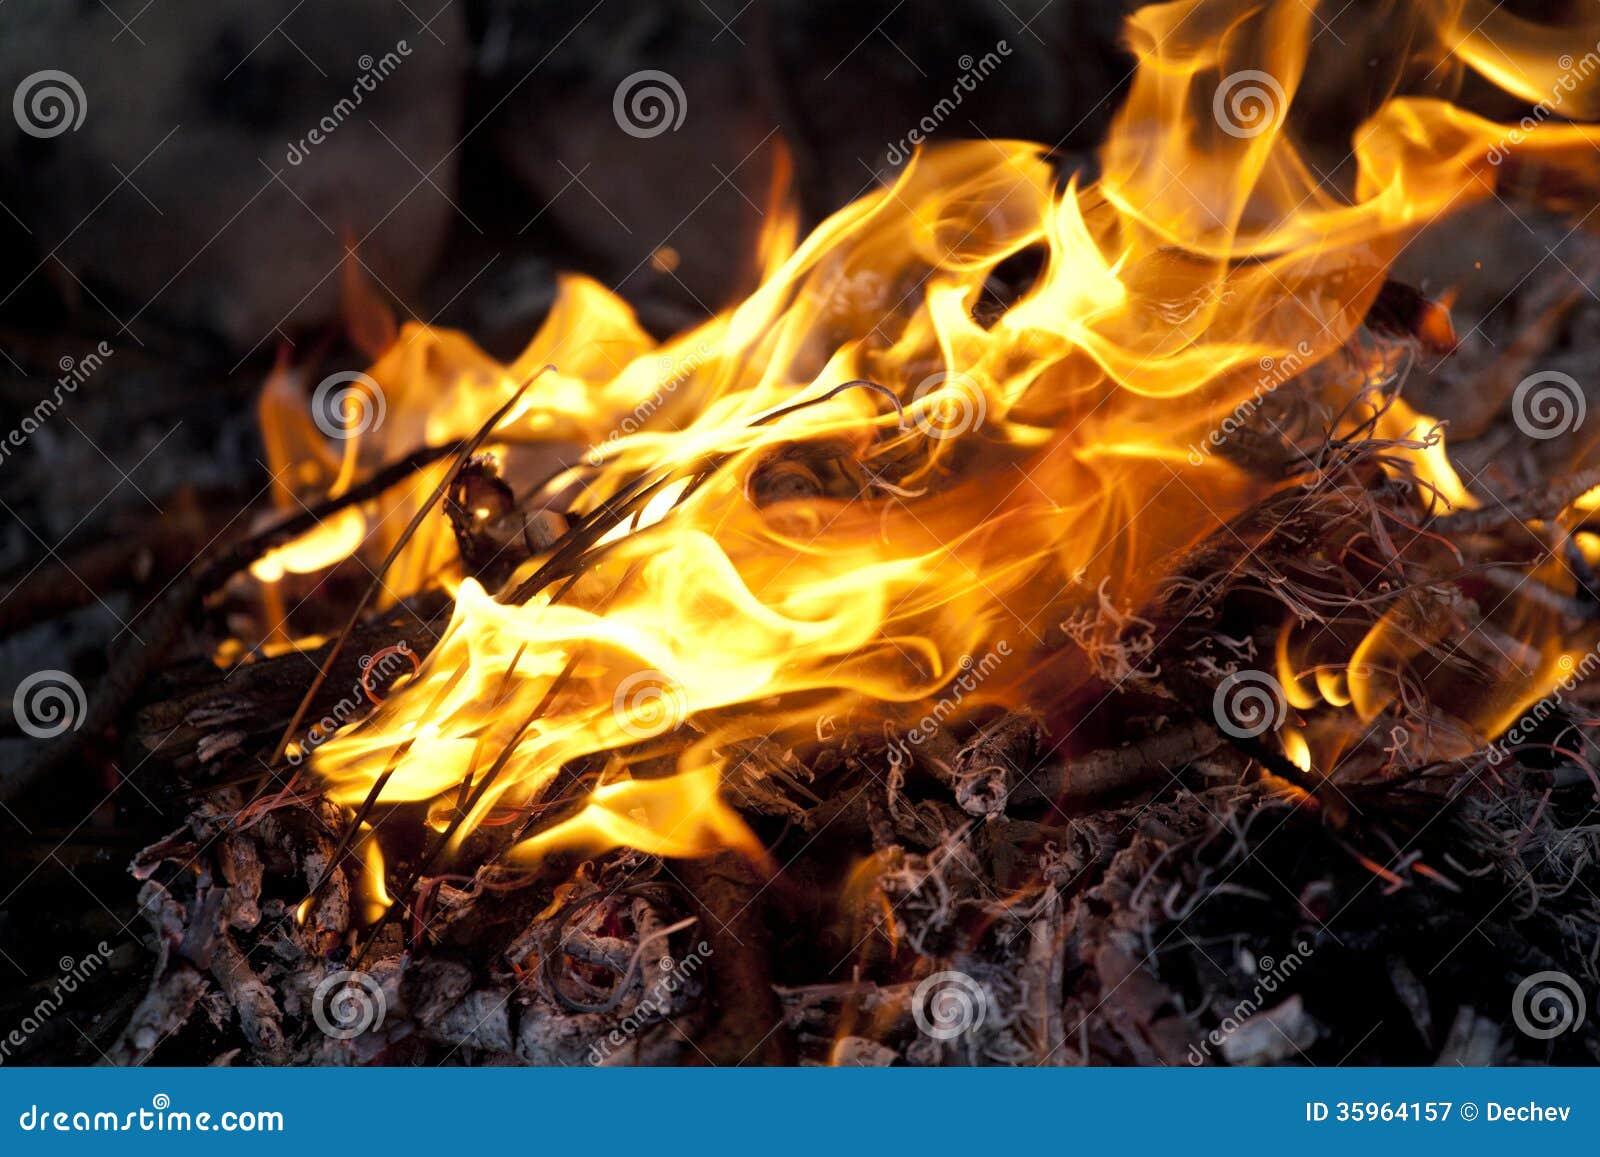 Fuego chispeante